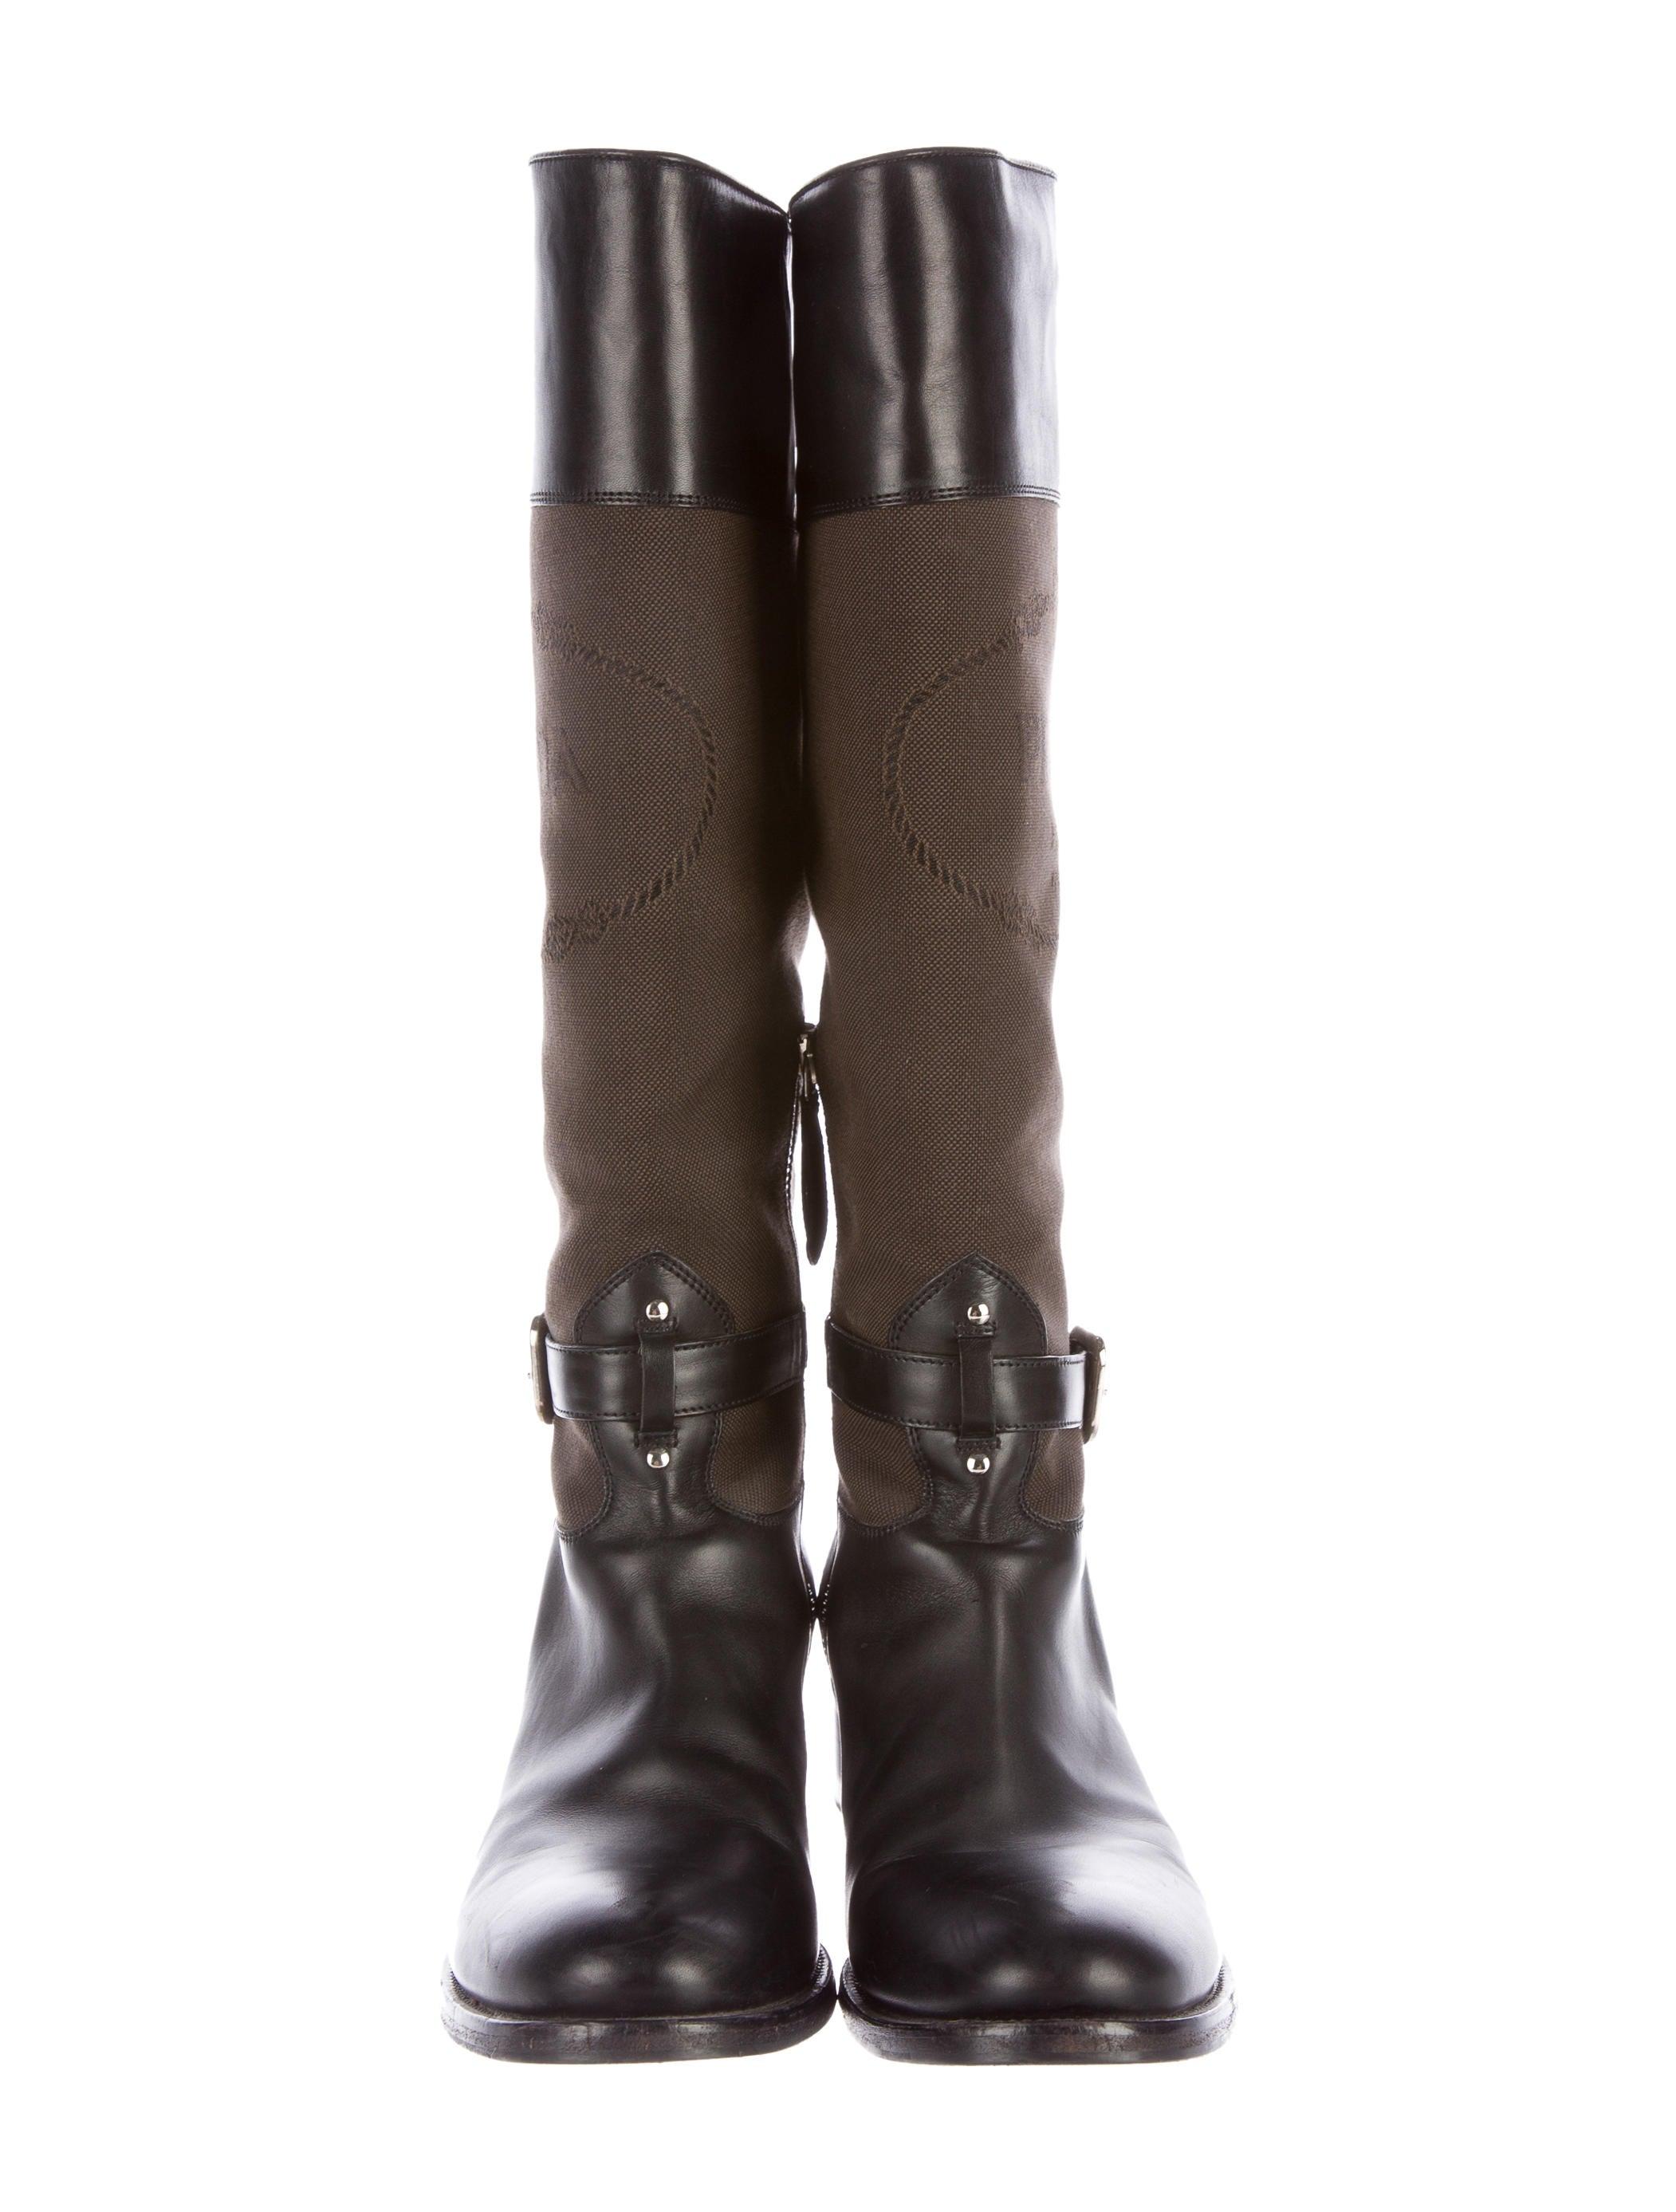 prada canvas knee high boots shoes pra134588 the